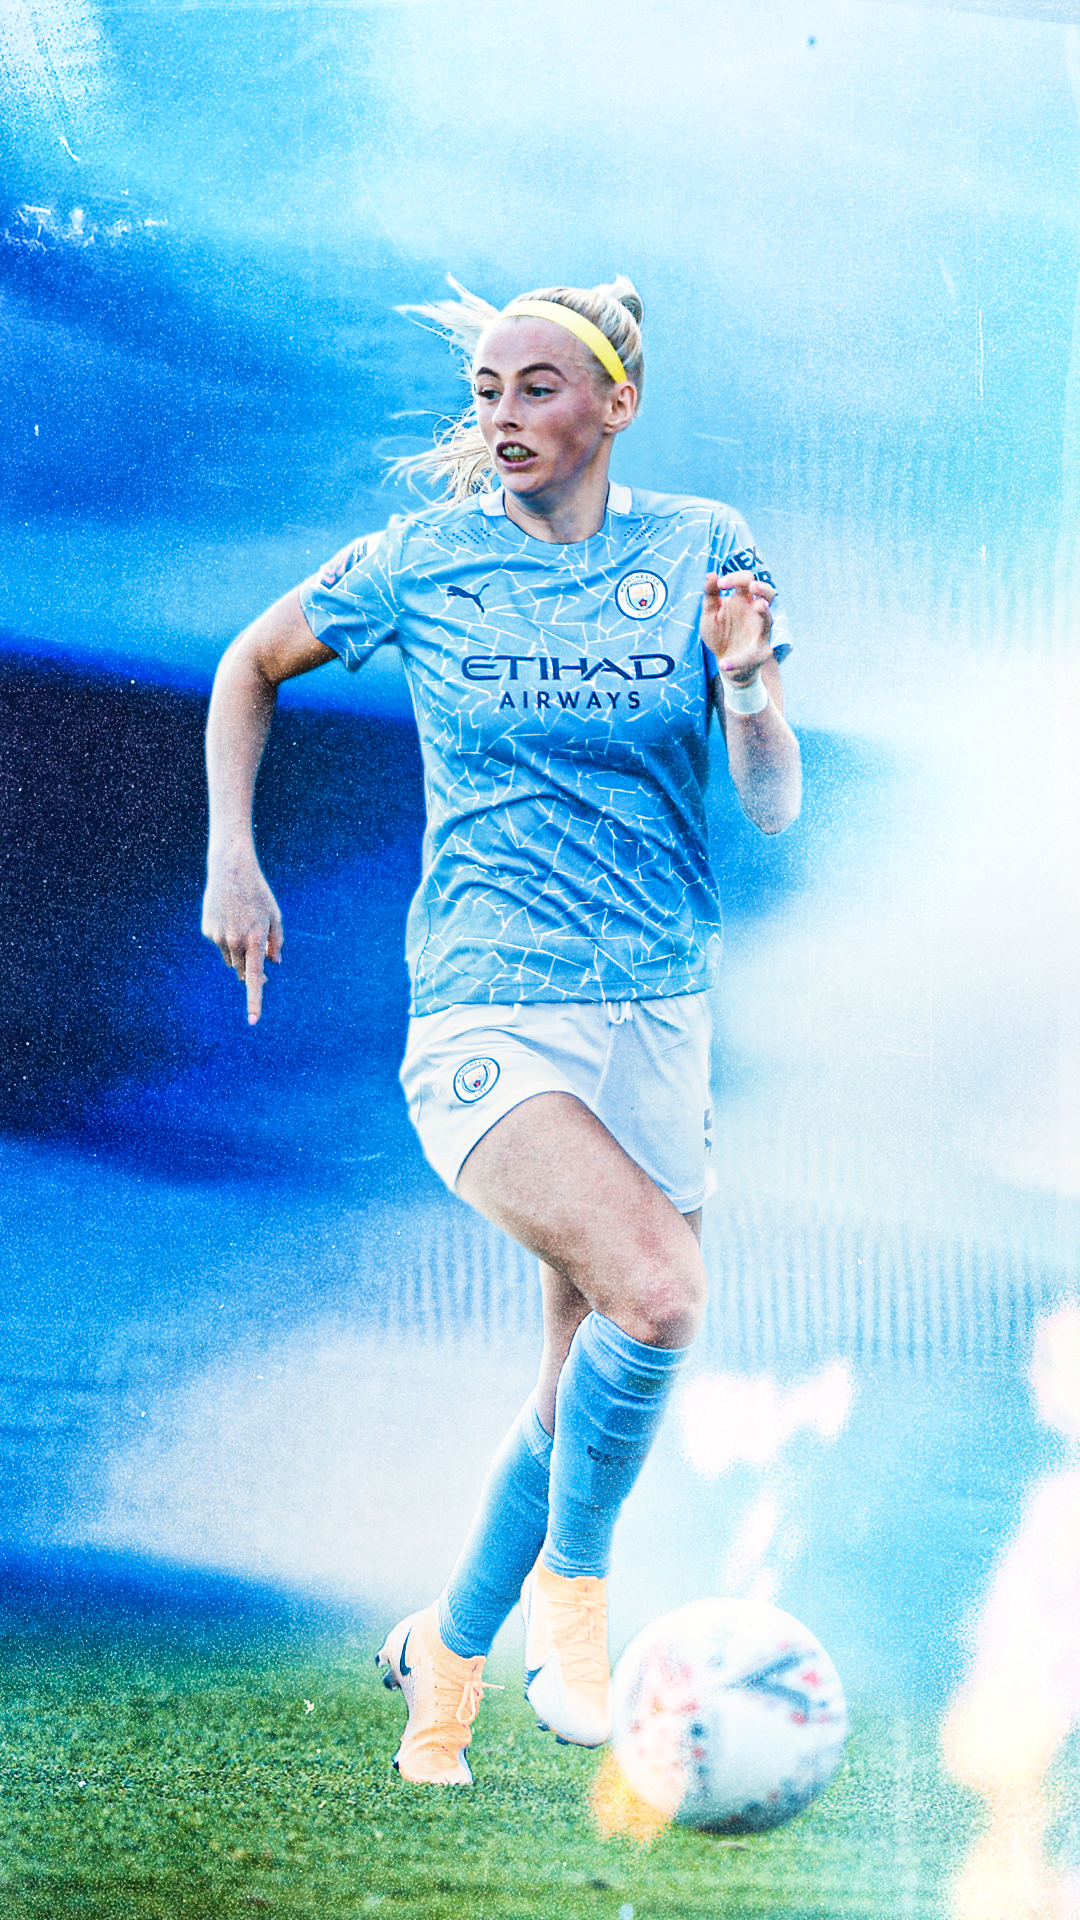 Manchester City - Wallpaper Wednesday 2020/21 | Joeri Gosens